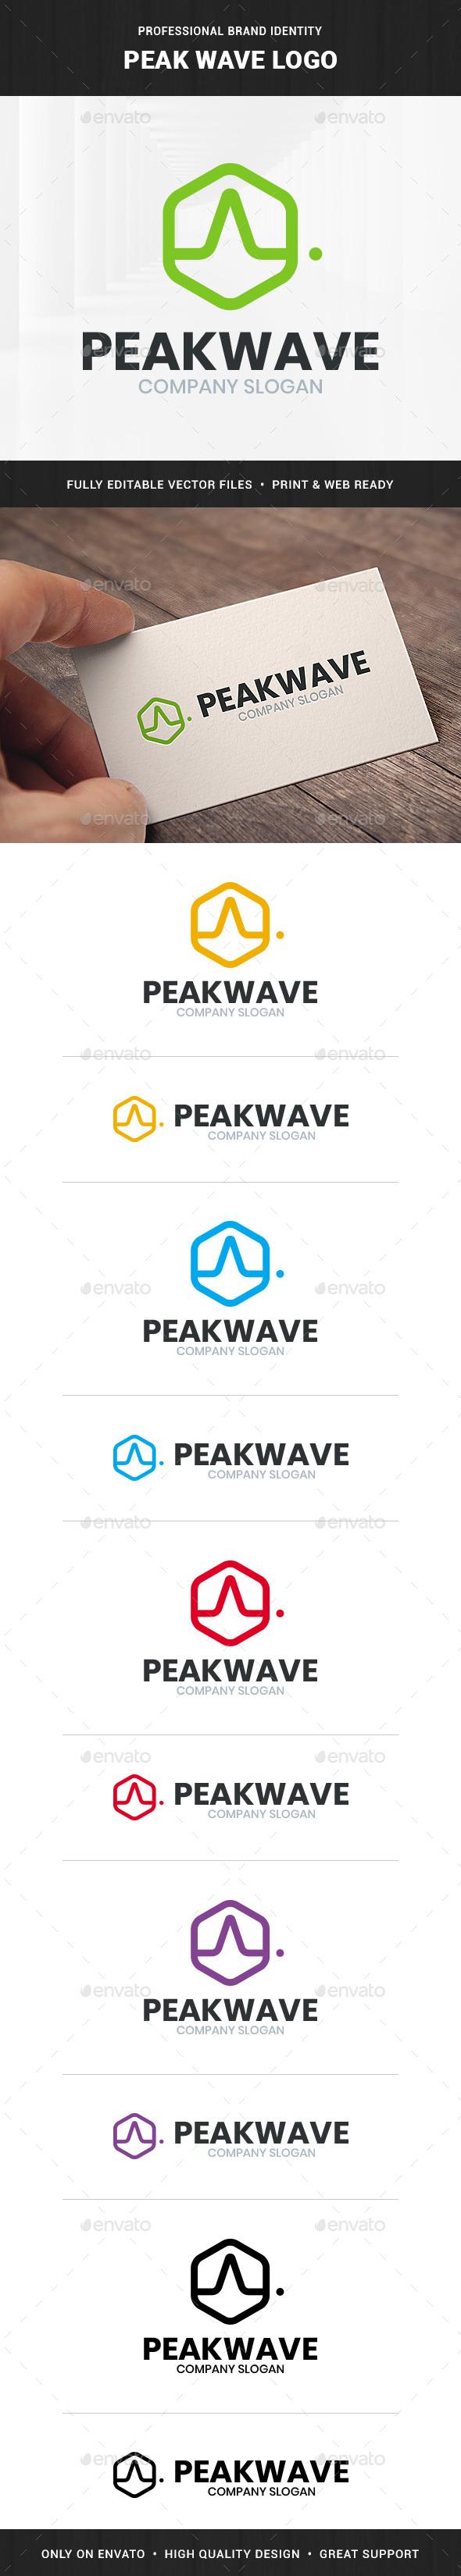 Peak Wave Logo Template